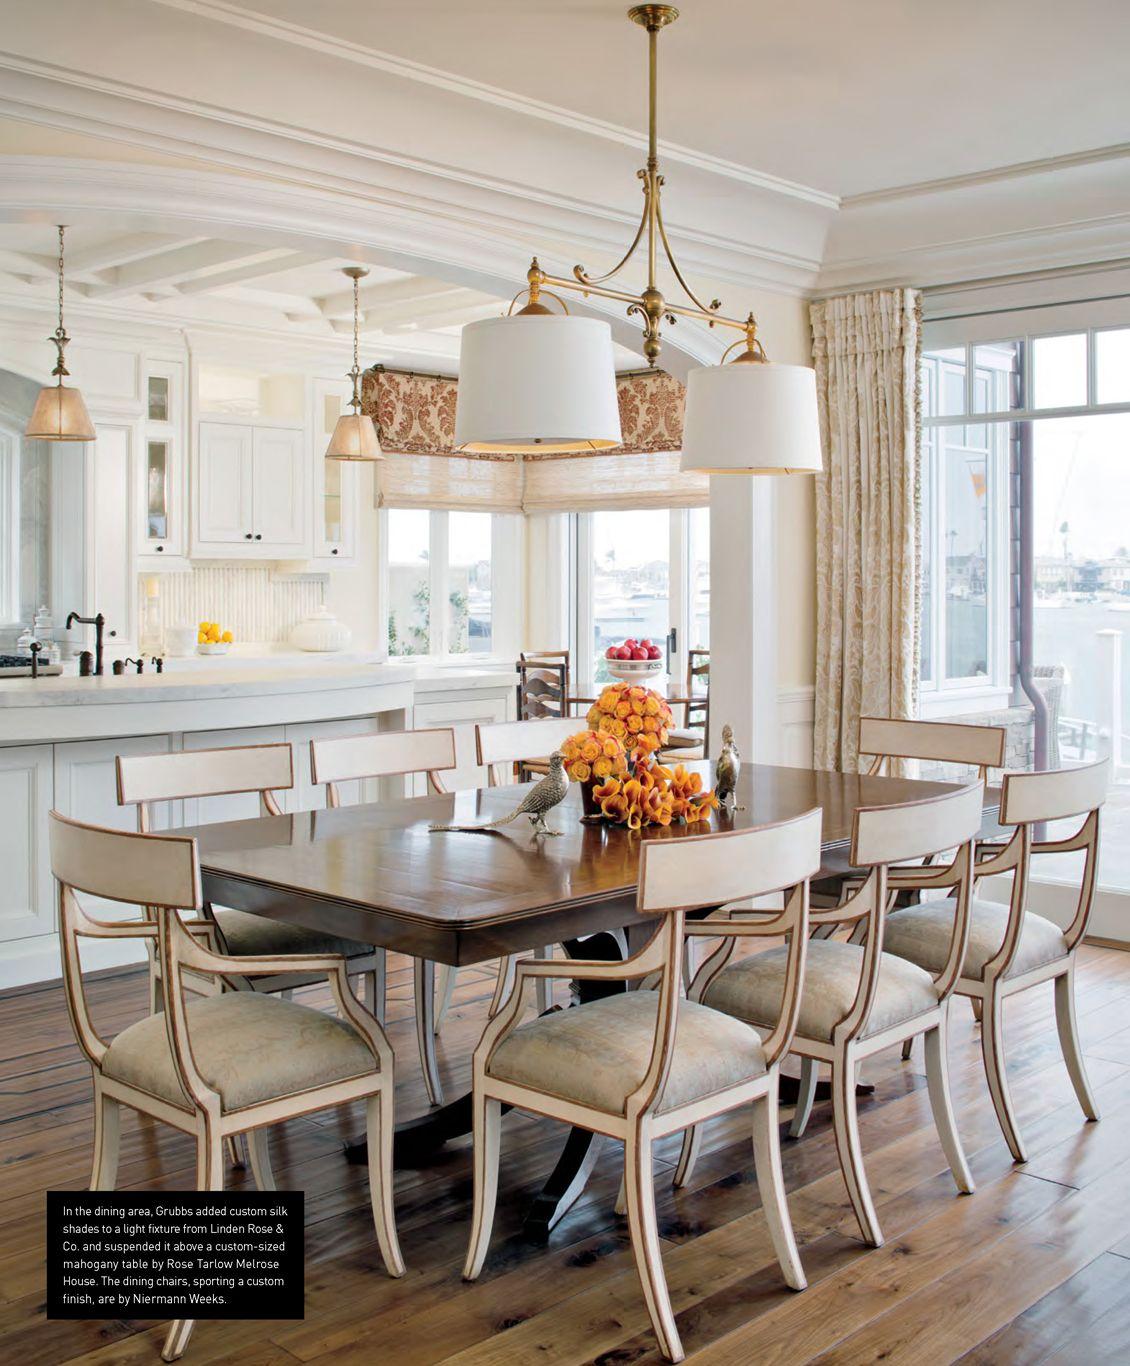 Niermann Weeks Elgin Chairs In A Southern California Dining